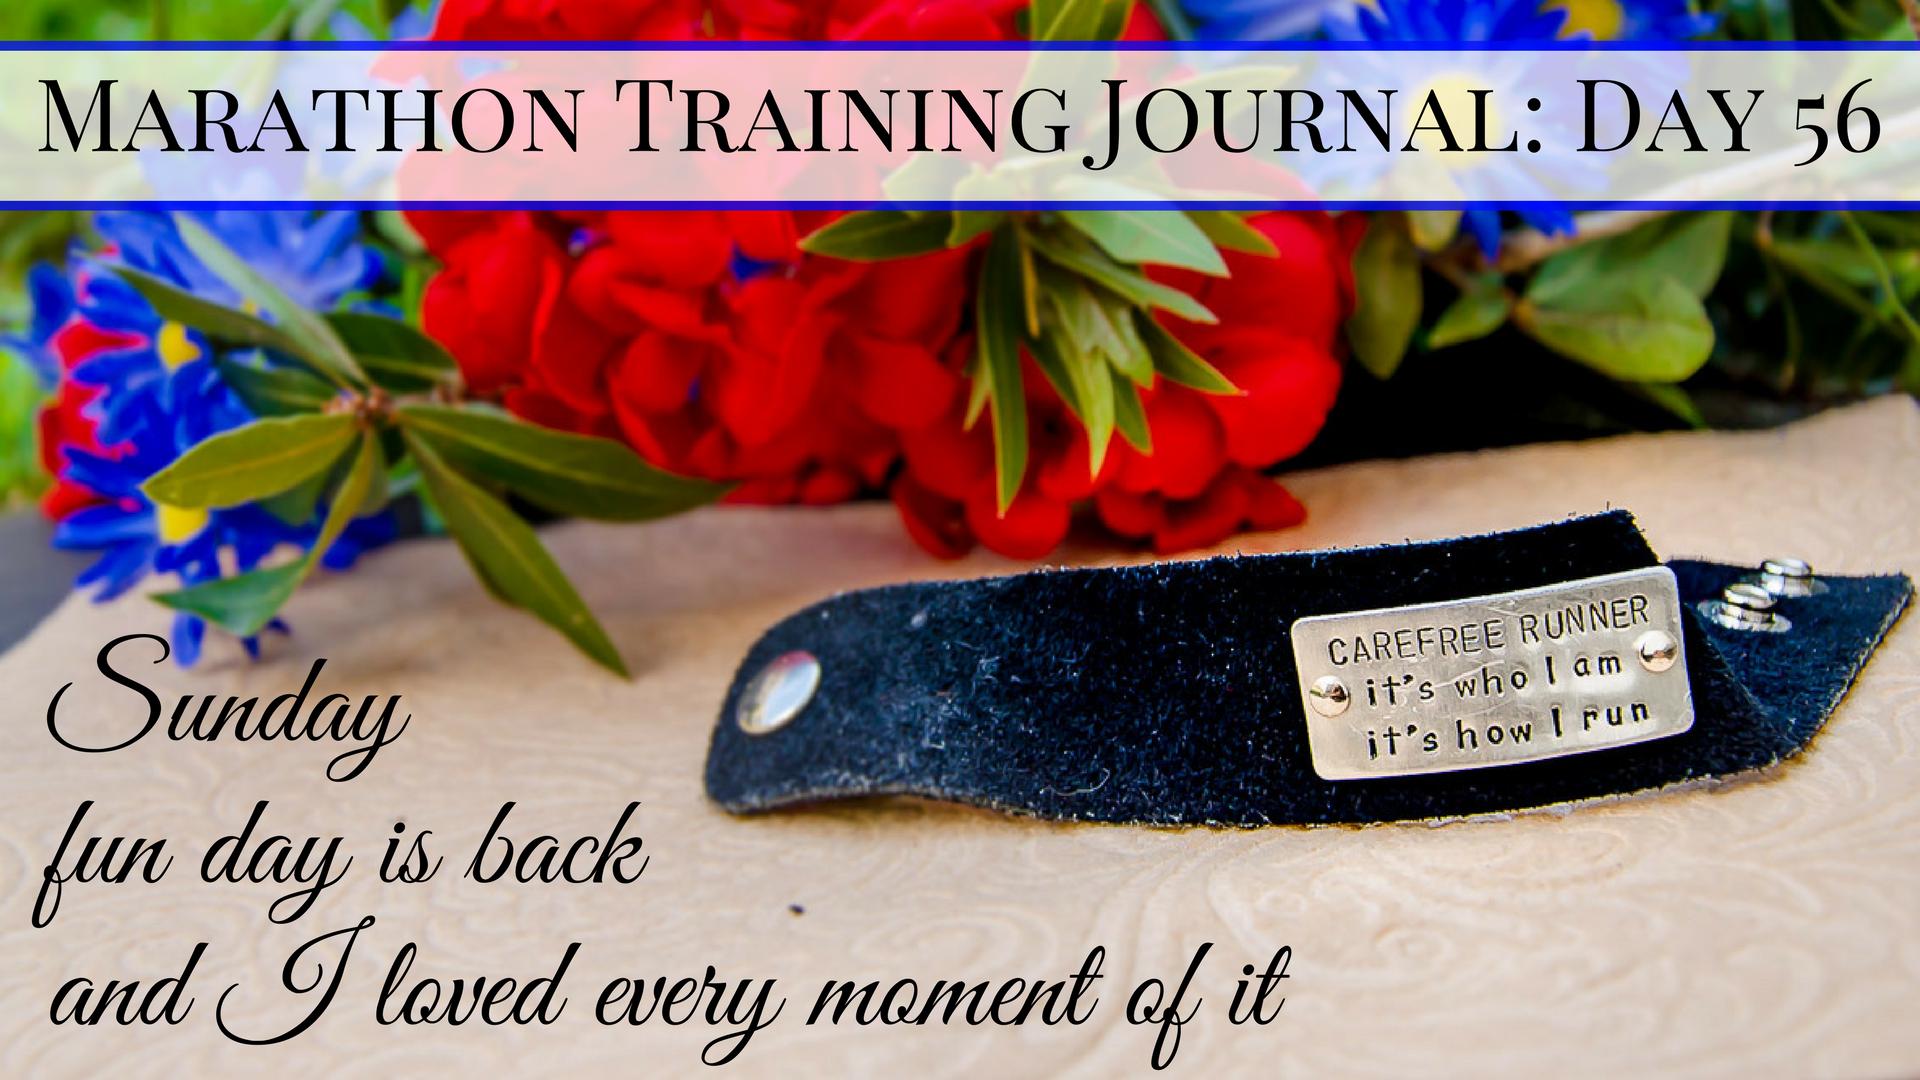 Copy of Marathon Training Journal Day 54